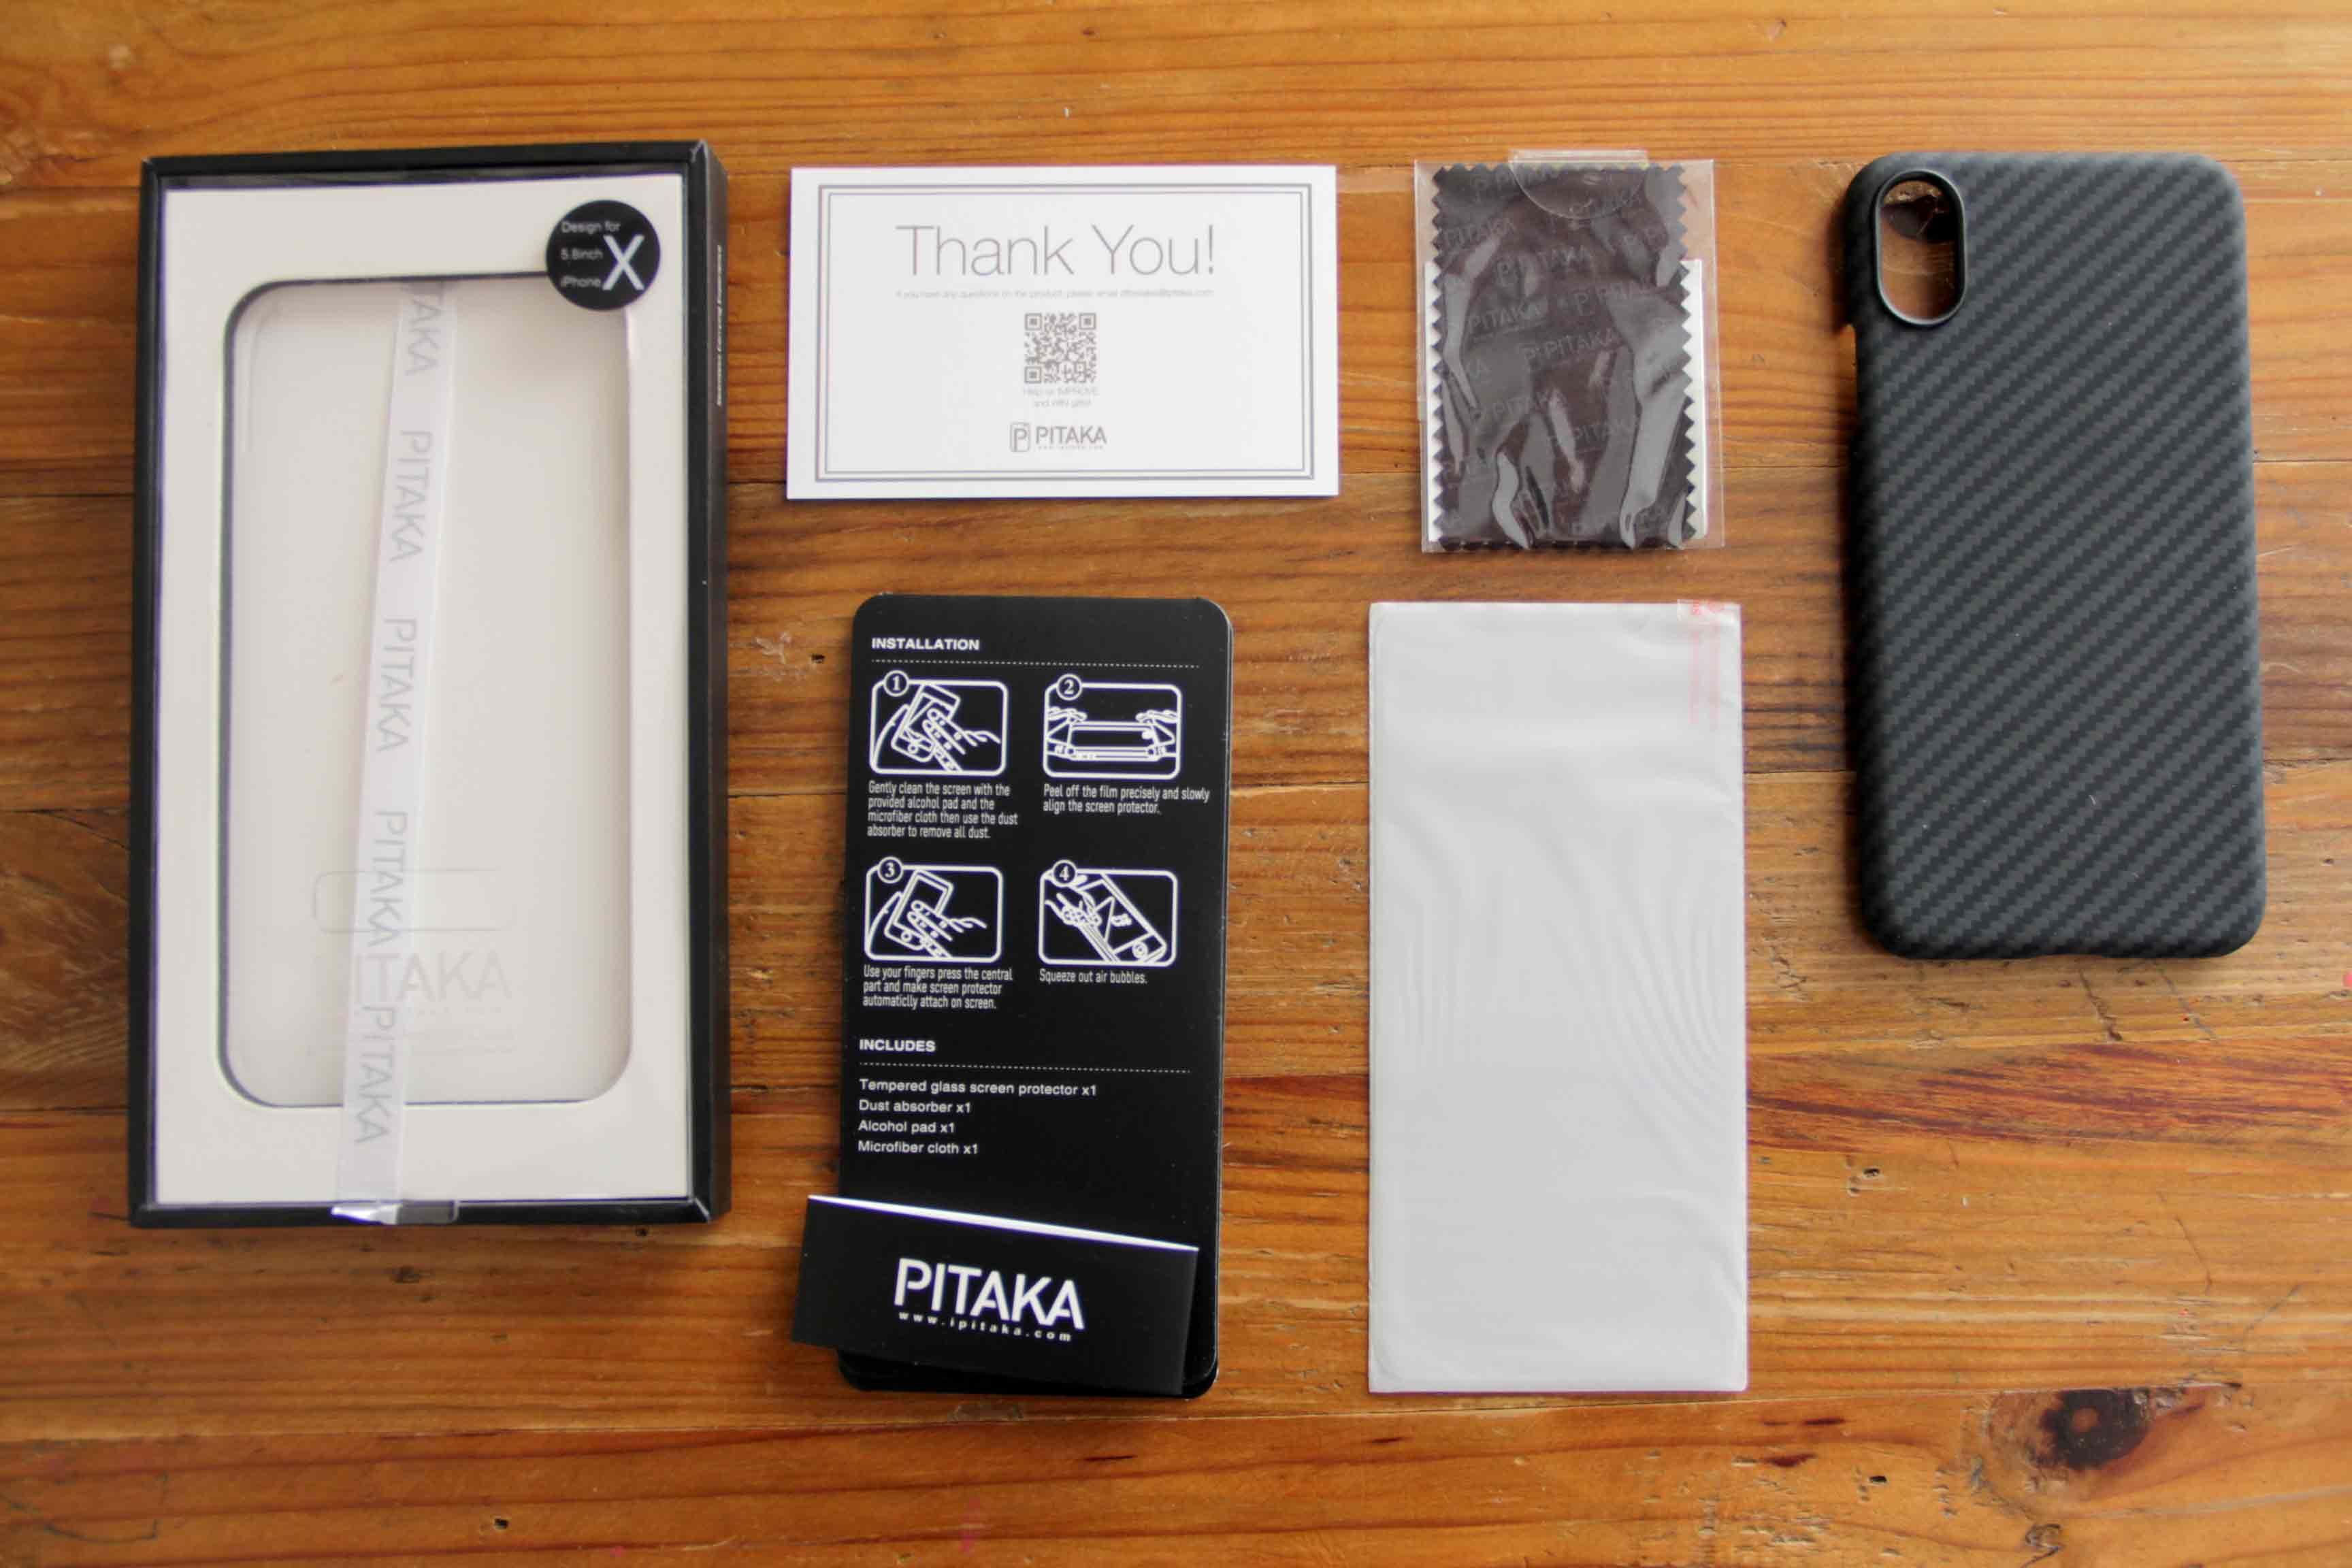 PITAKA iPhoneXケース同梱物の写真